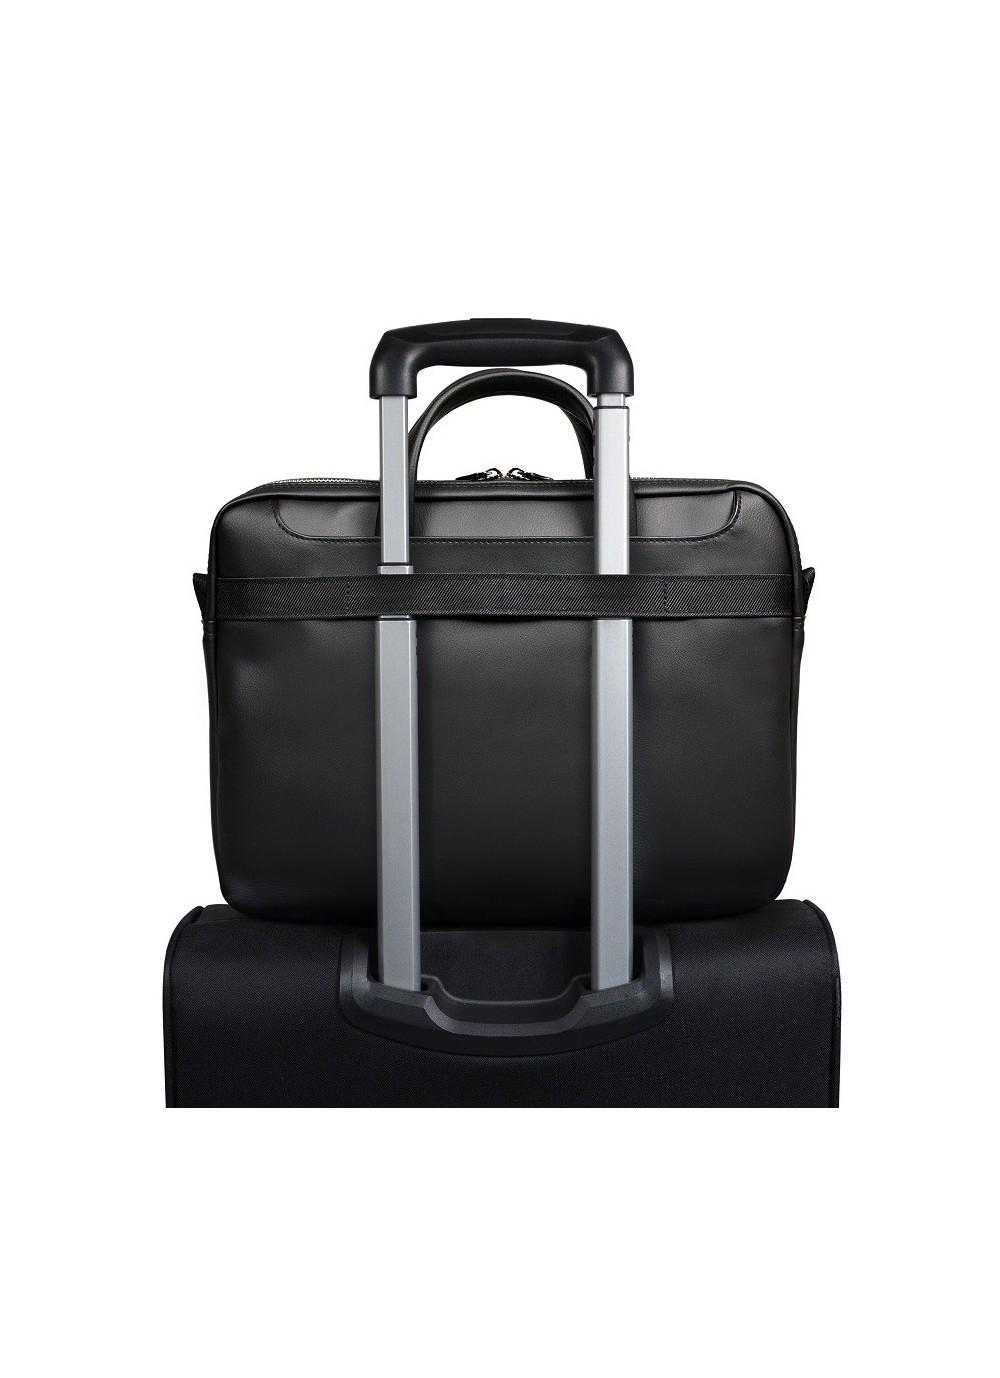 ZURICH Toploading case - Port Designs ba347c510d